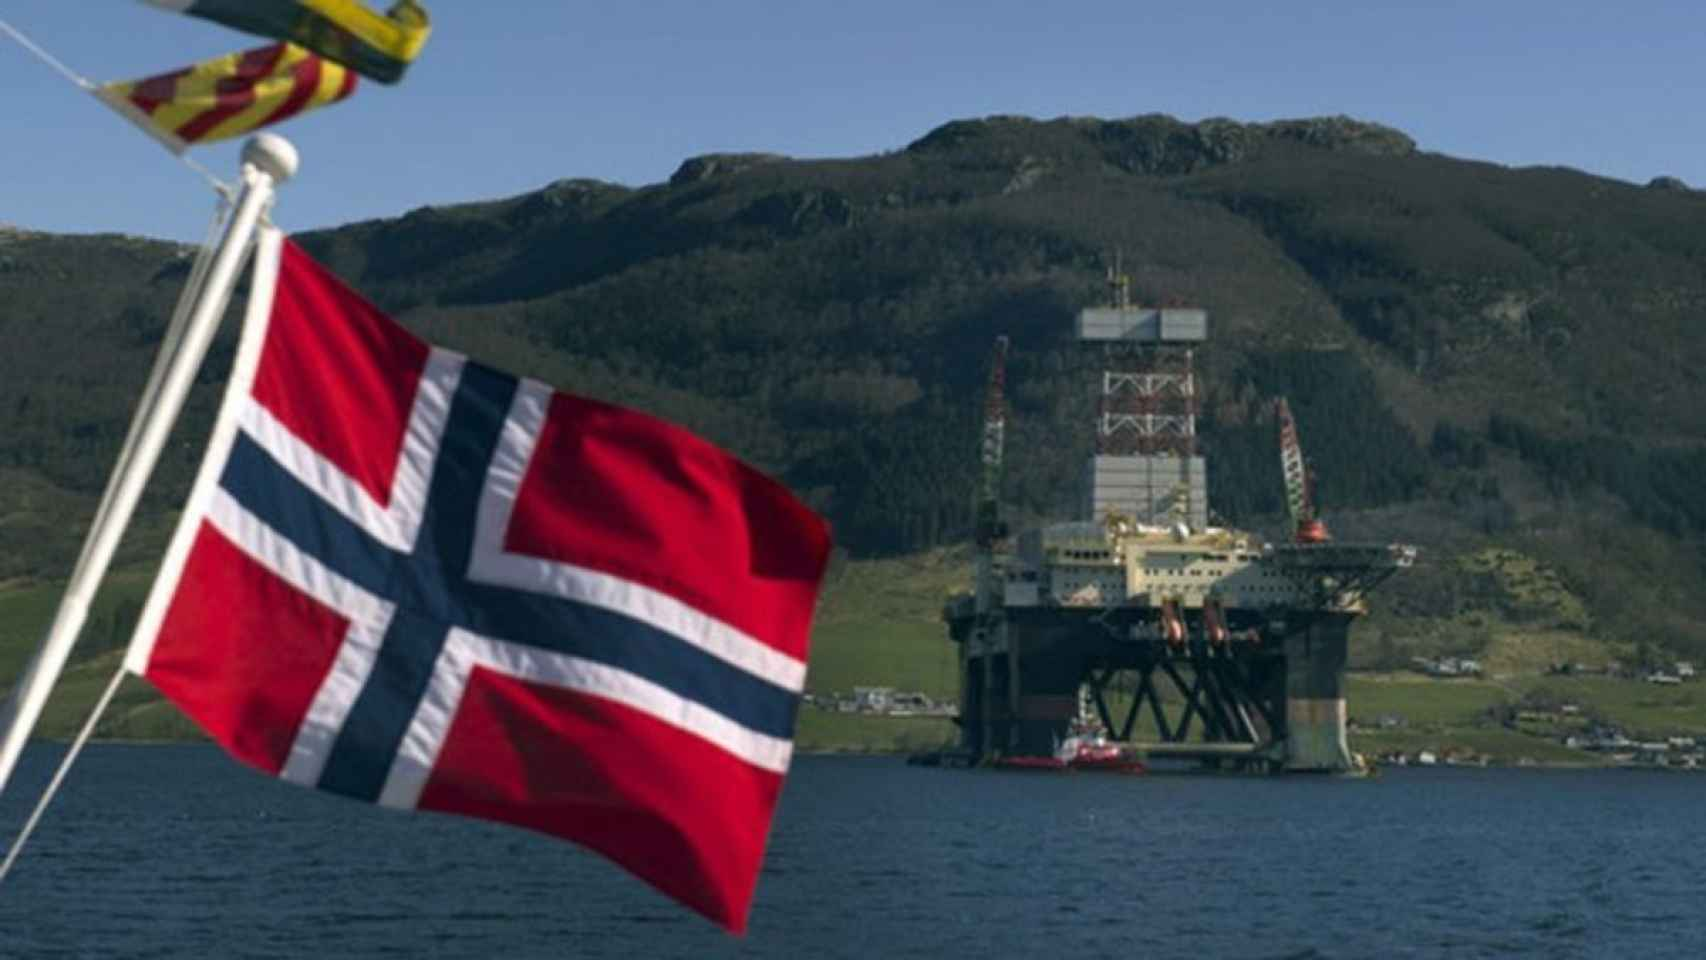 La bandera de Noruega frente a una plataforma petrolera.